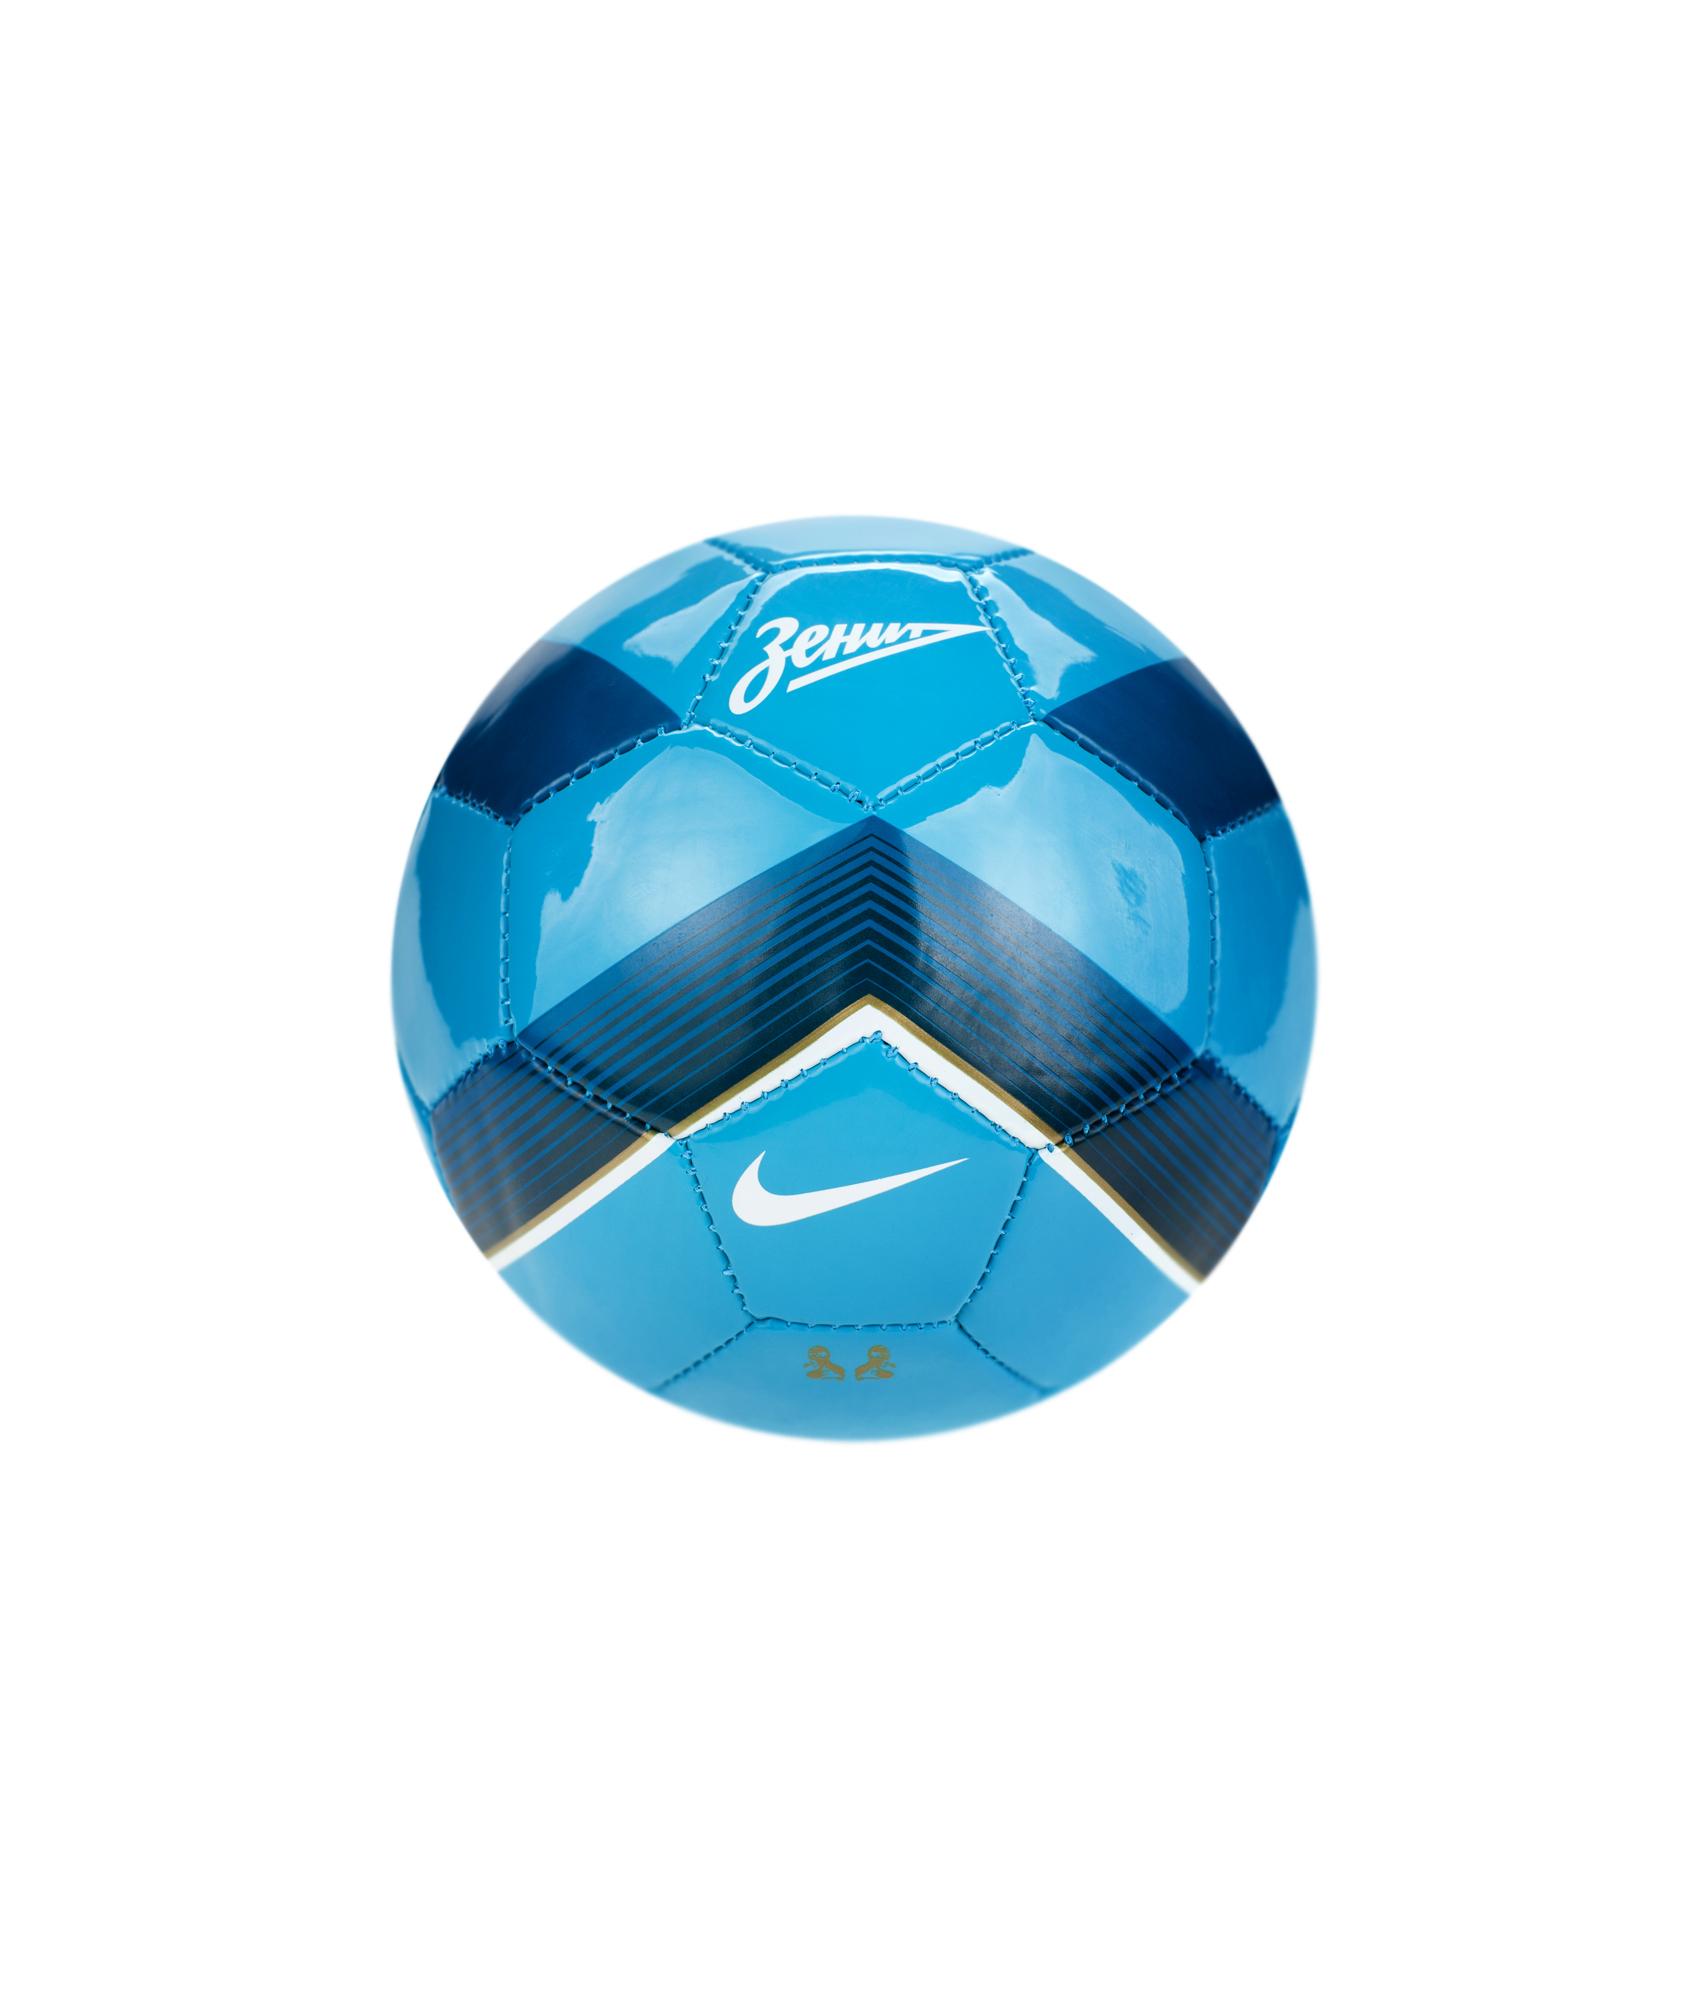 Мяч Nike ZENIT SKILLS, Цвет-Голубой, Размер-1